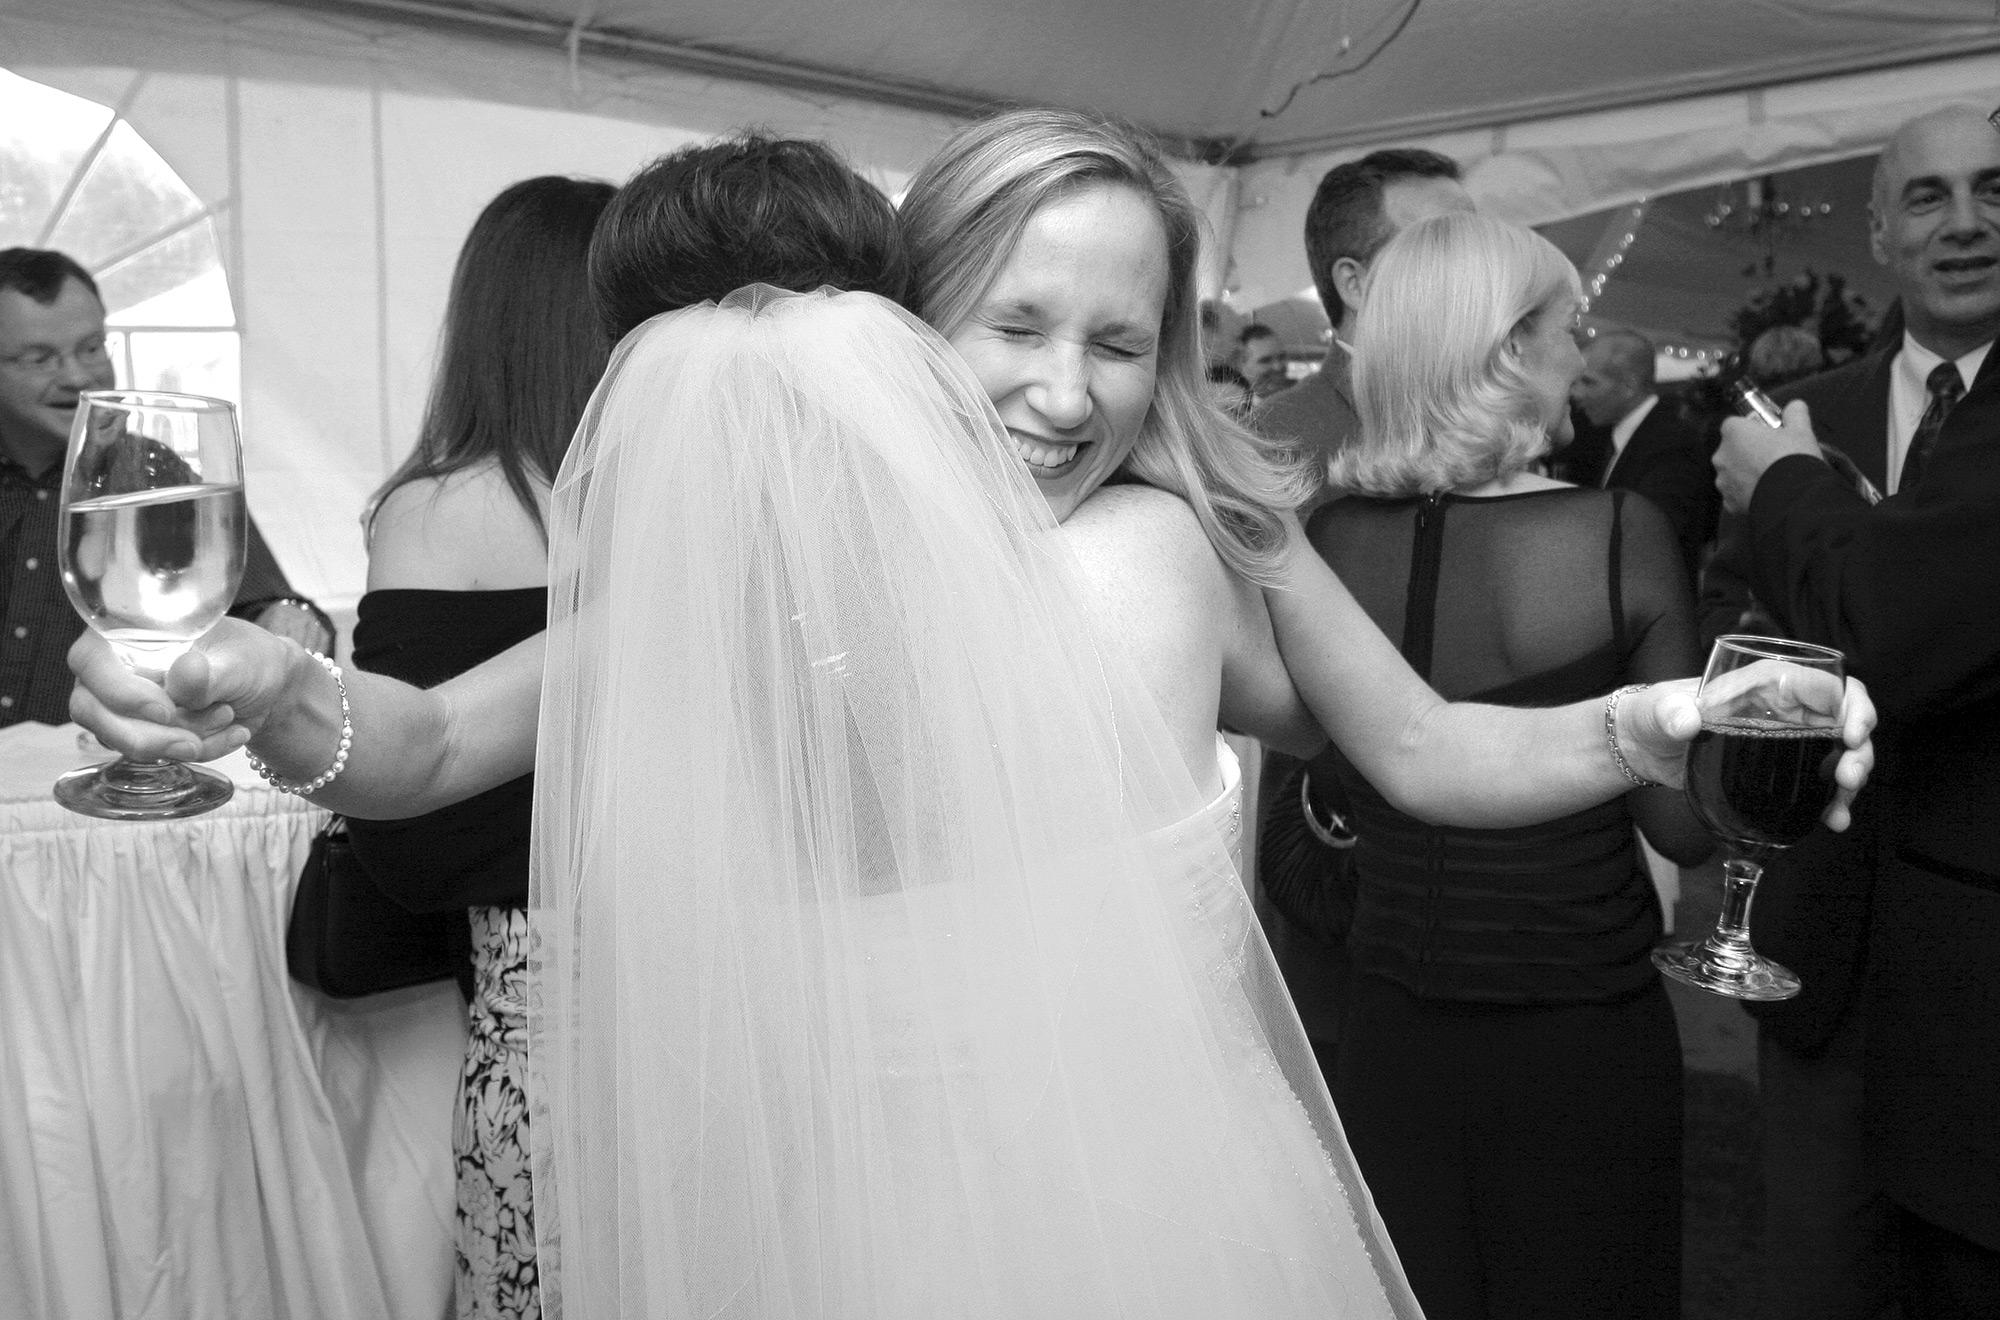 wedding-photography-saint-paul-mark-kegans-661.jpg